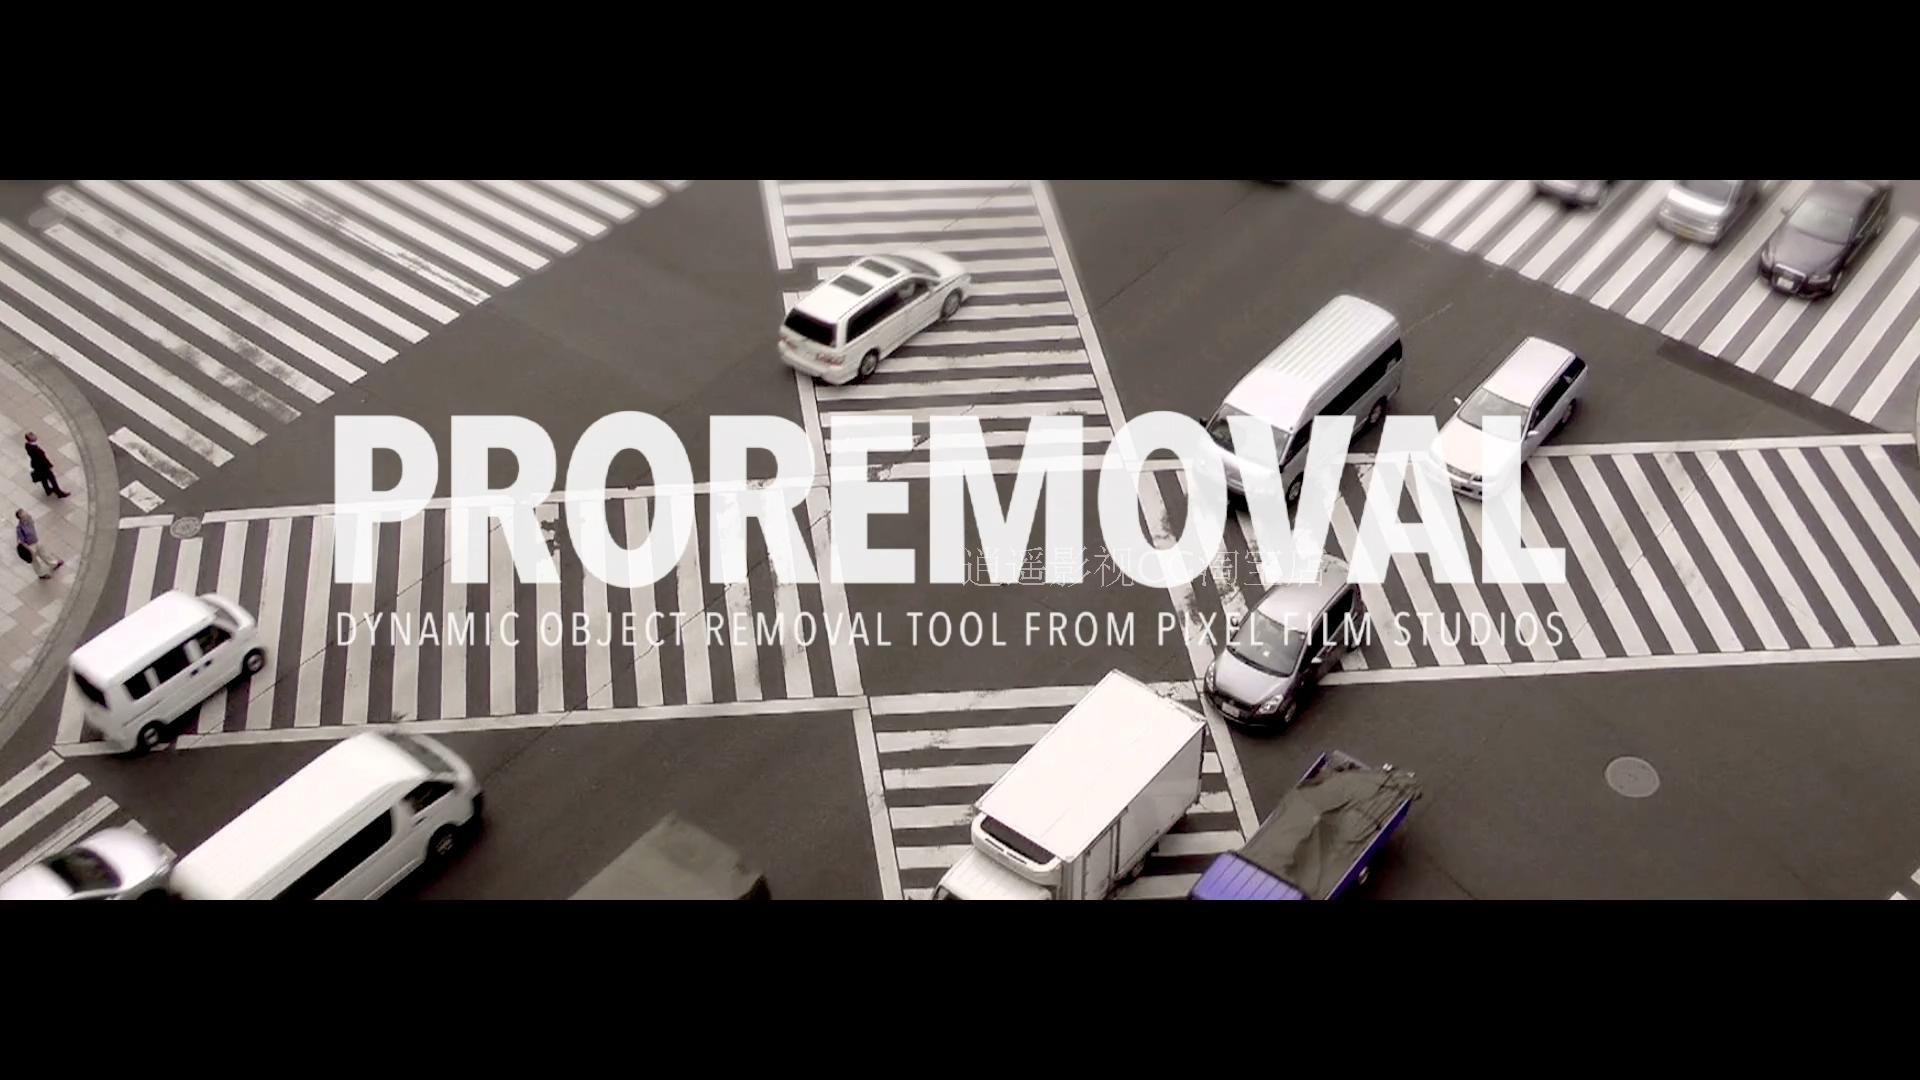 FCPX插件:专业移除多余动态物体修补插件 PROREMOVAL - 第2张  | VFXREEL-逍遥影视CG部落